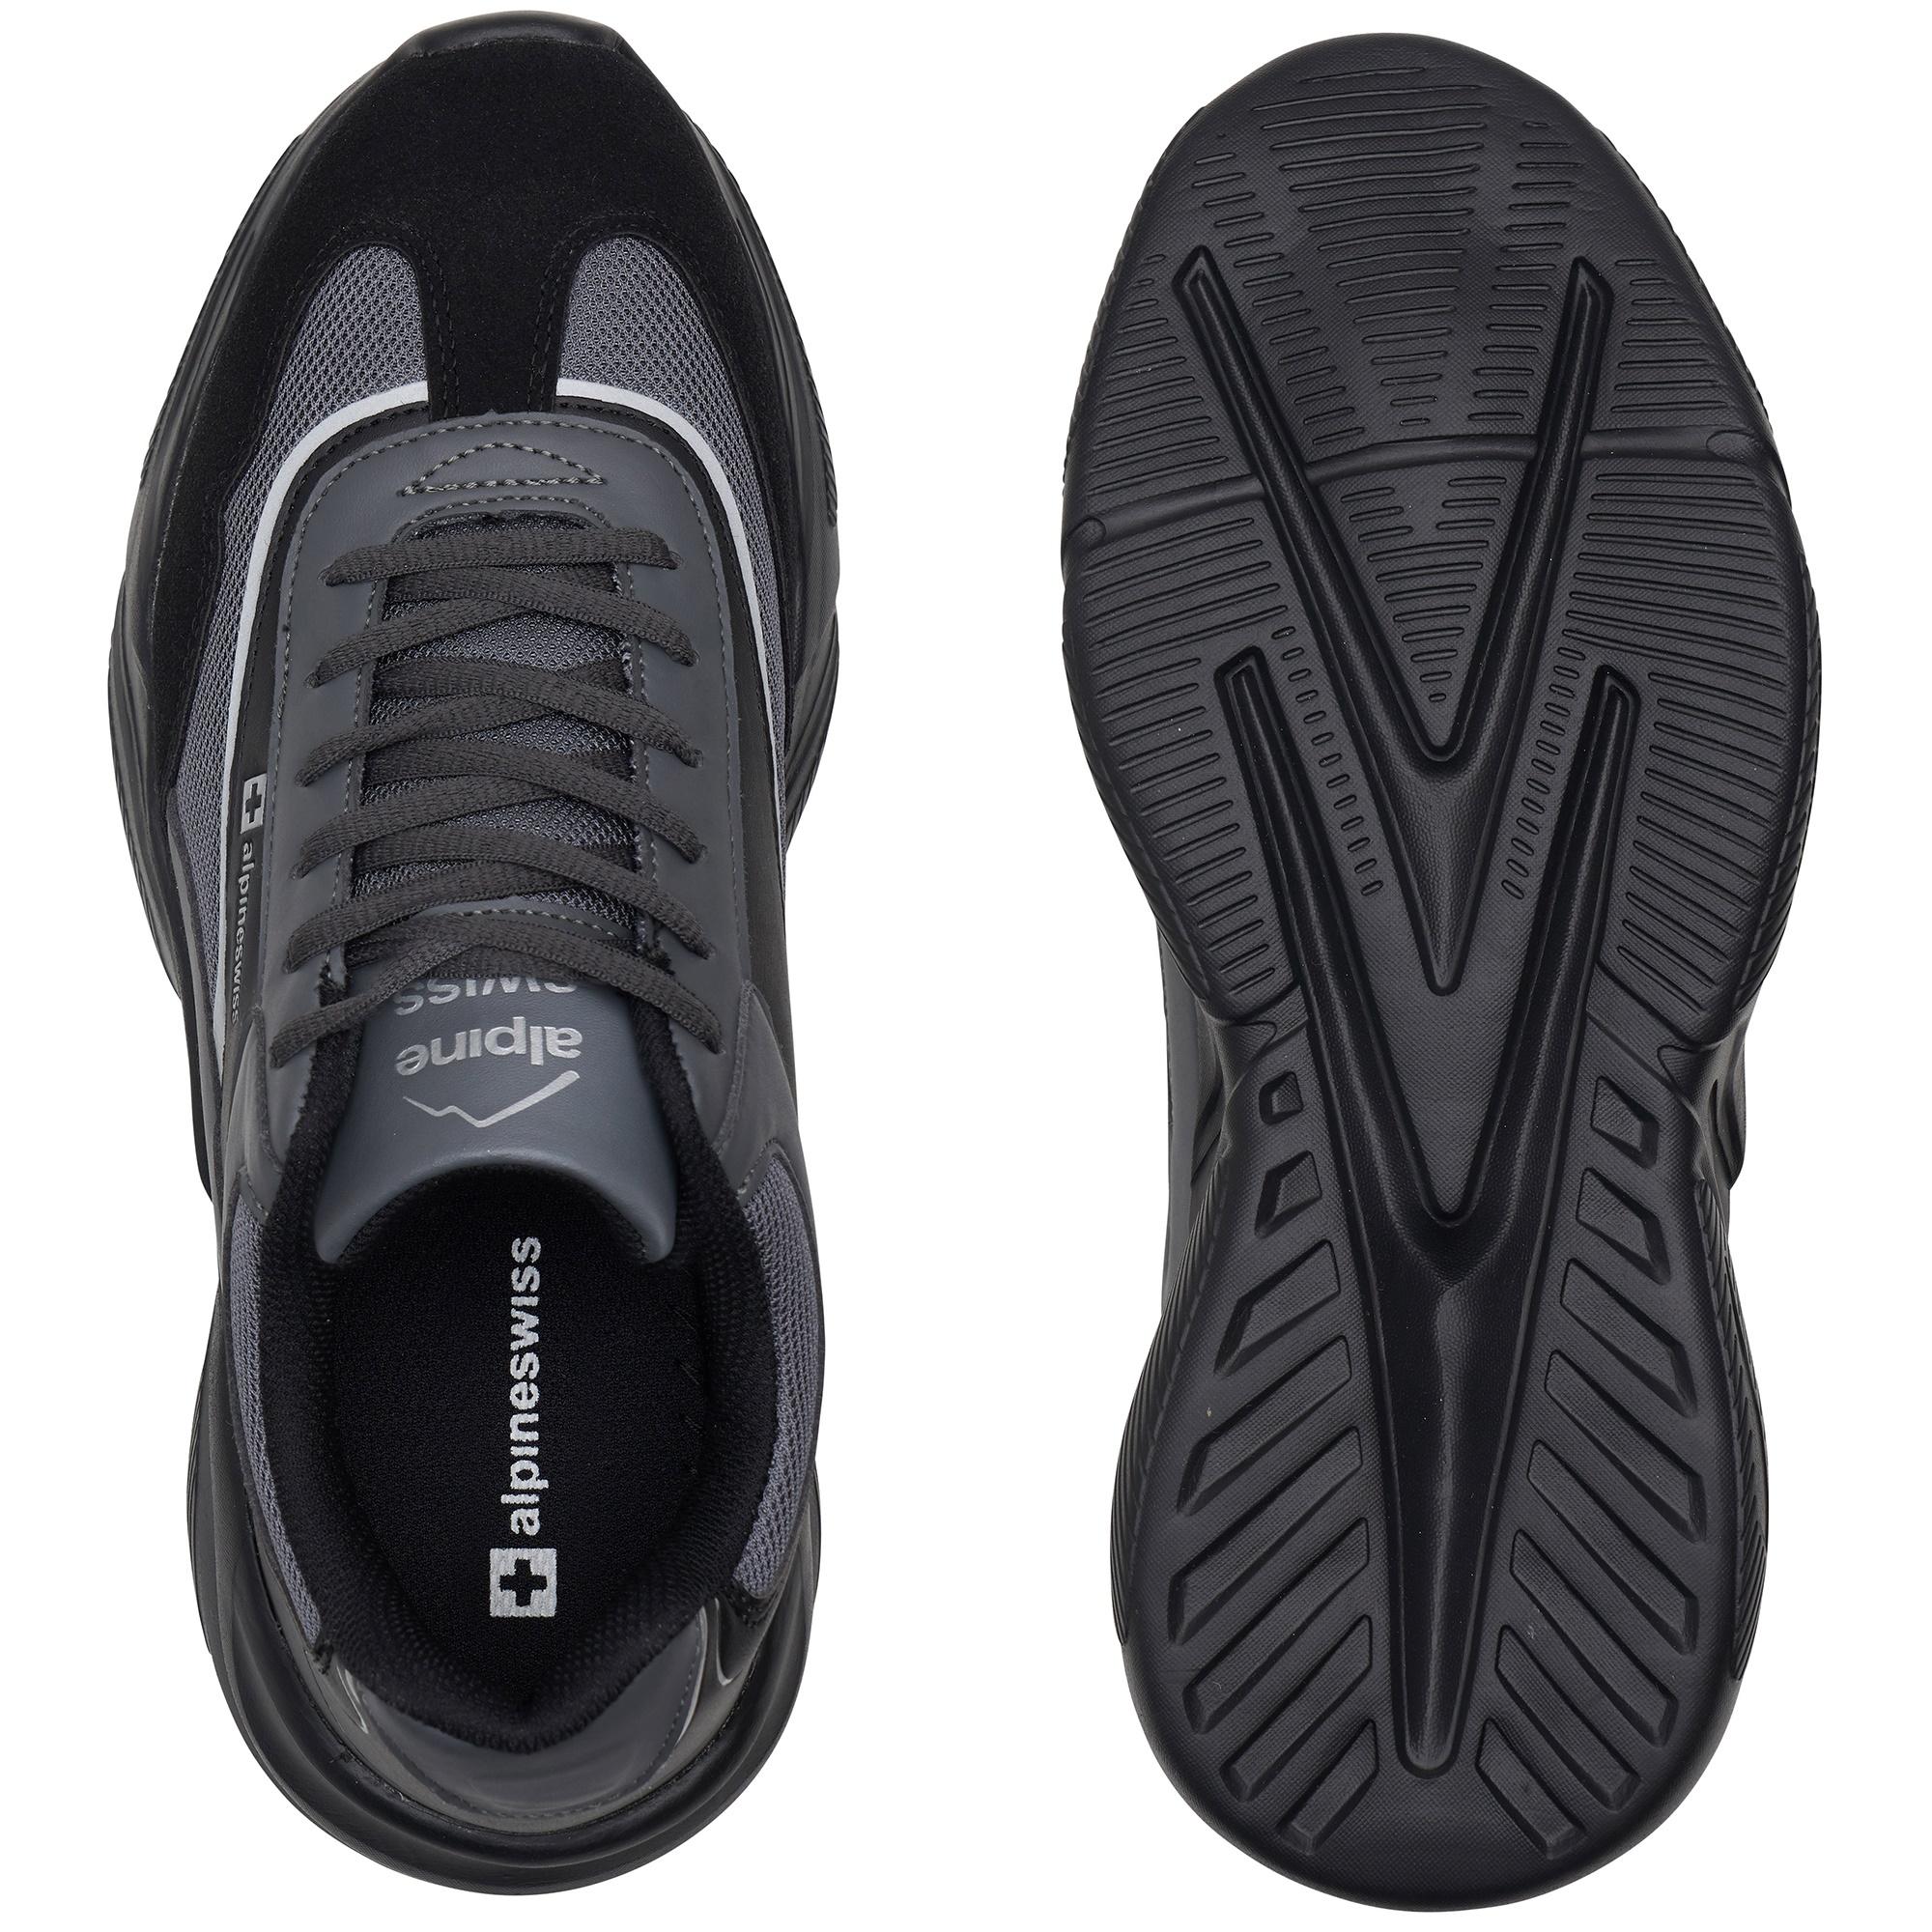 Alpine-Swiss-Stuart-Mens-Chunky-Sneakers-Retro-Platform-Dad-Tennis-Shoes thumbnail 16